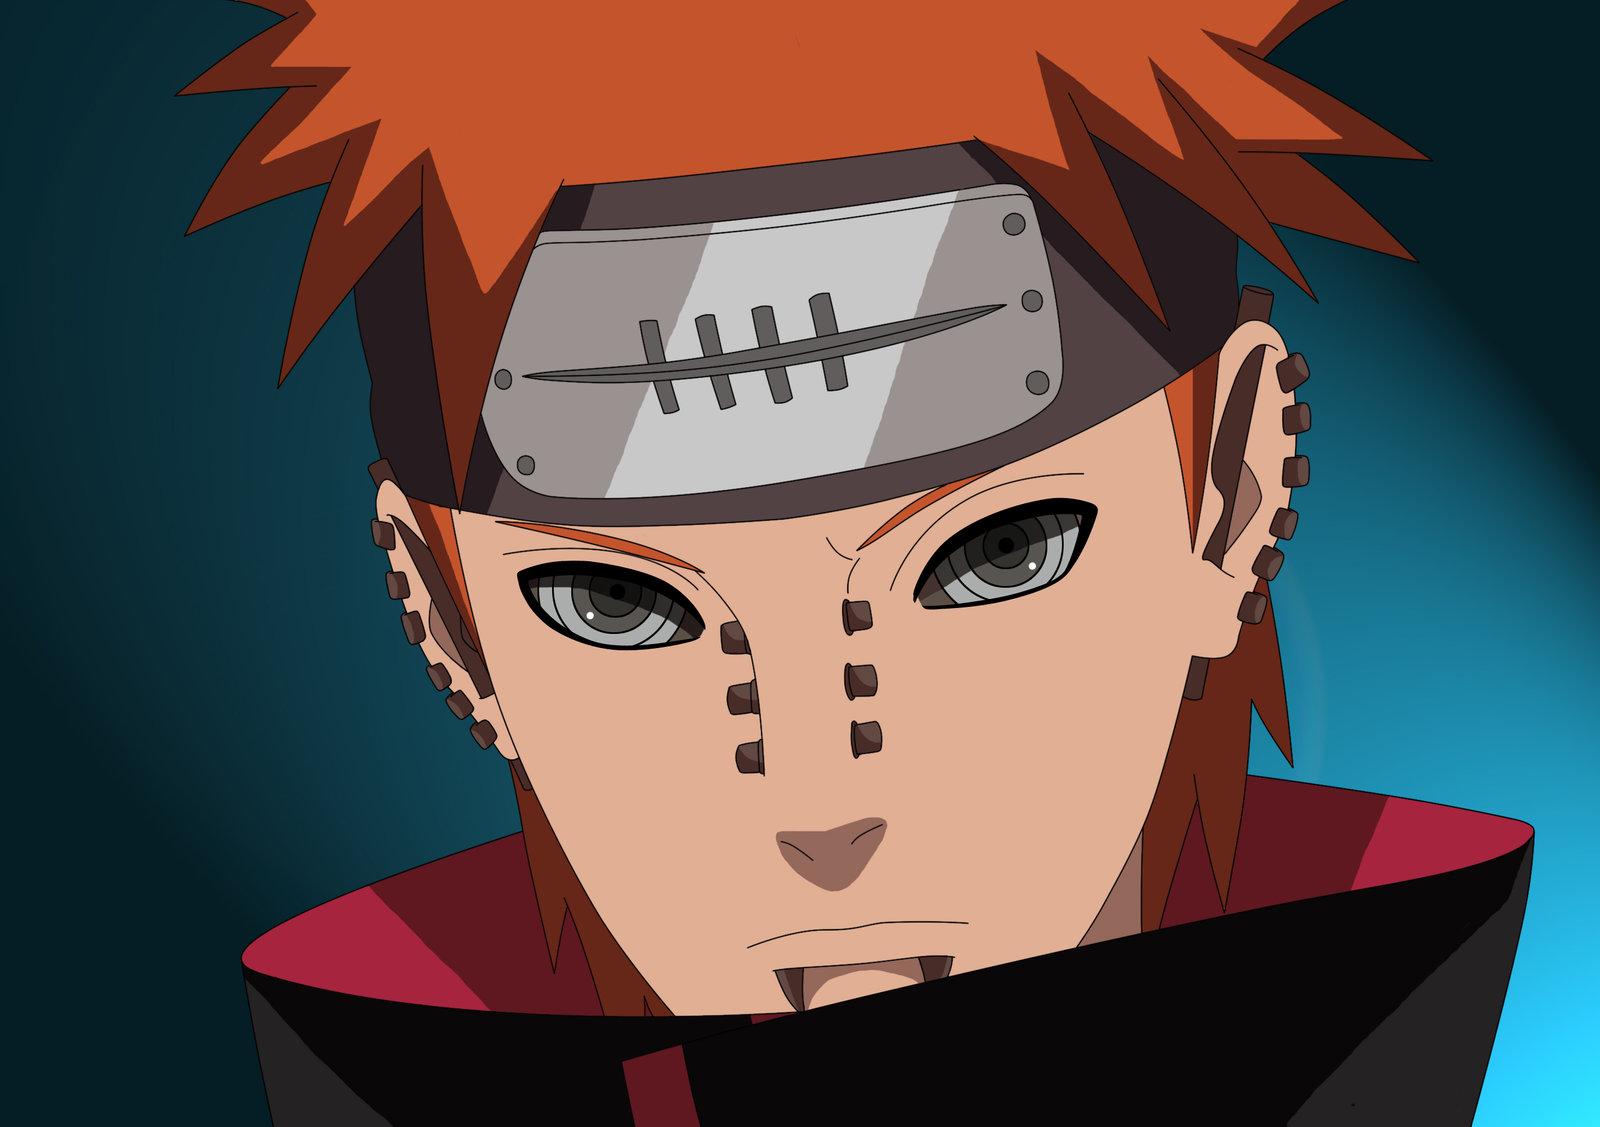 Pain Naruto Wallpaper Anime Cartoon Wallpaper 1600x1127